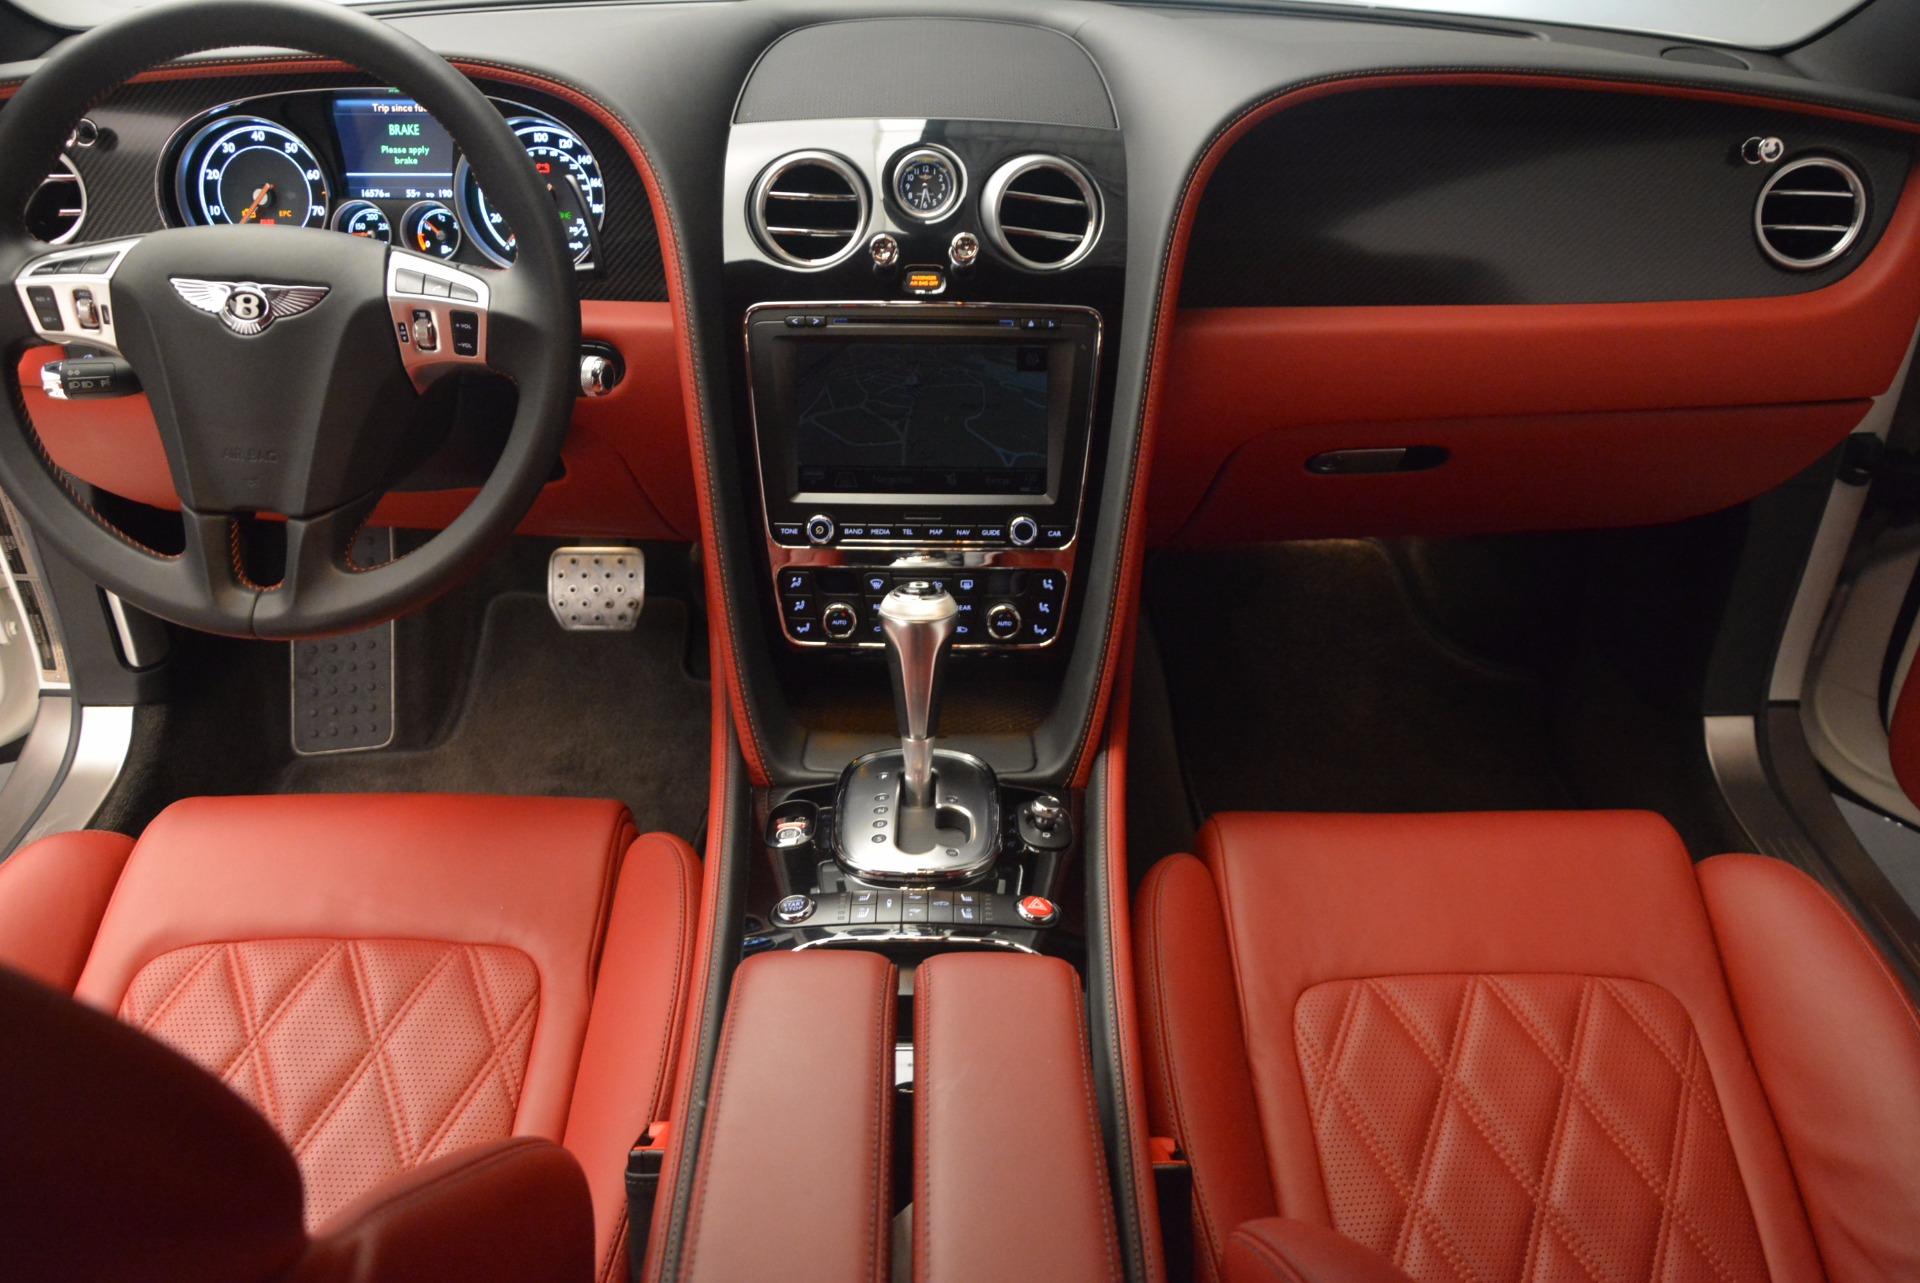 Used 2014 Bentley Continental GT Speed For Sale In Westport, CT 1102_p27